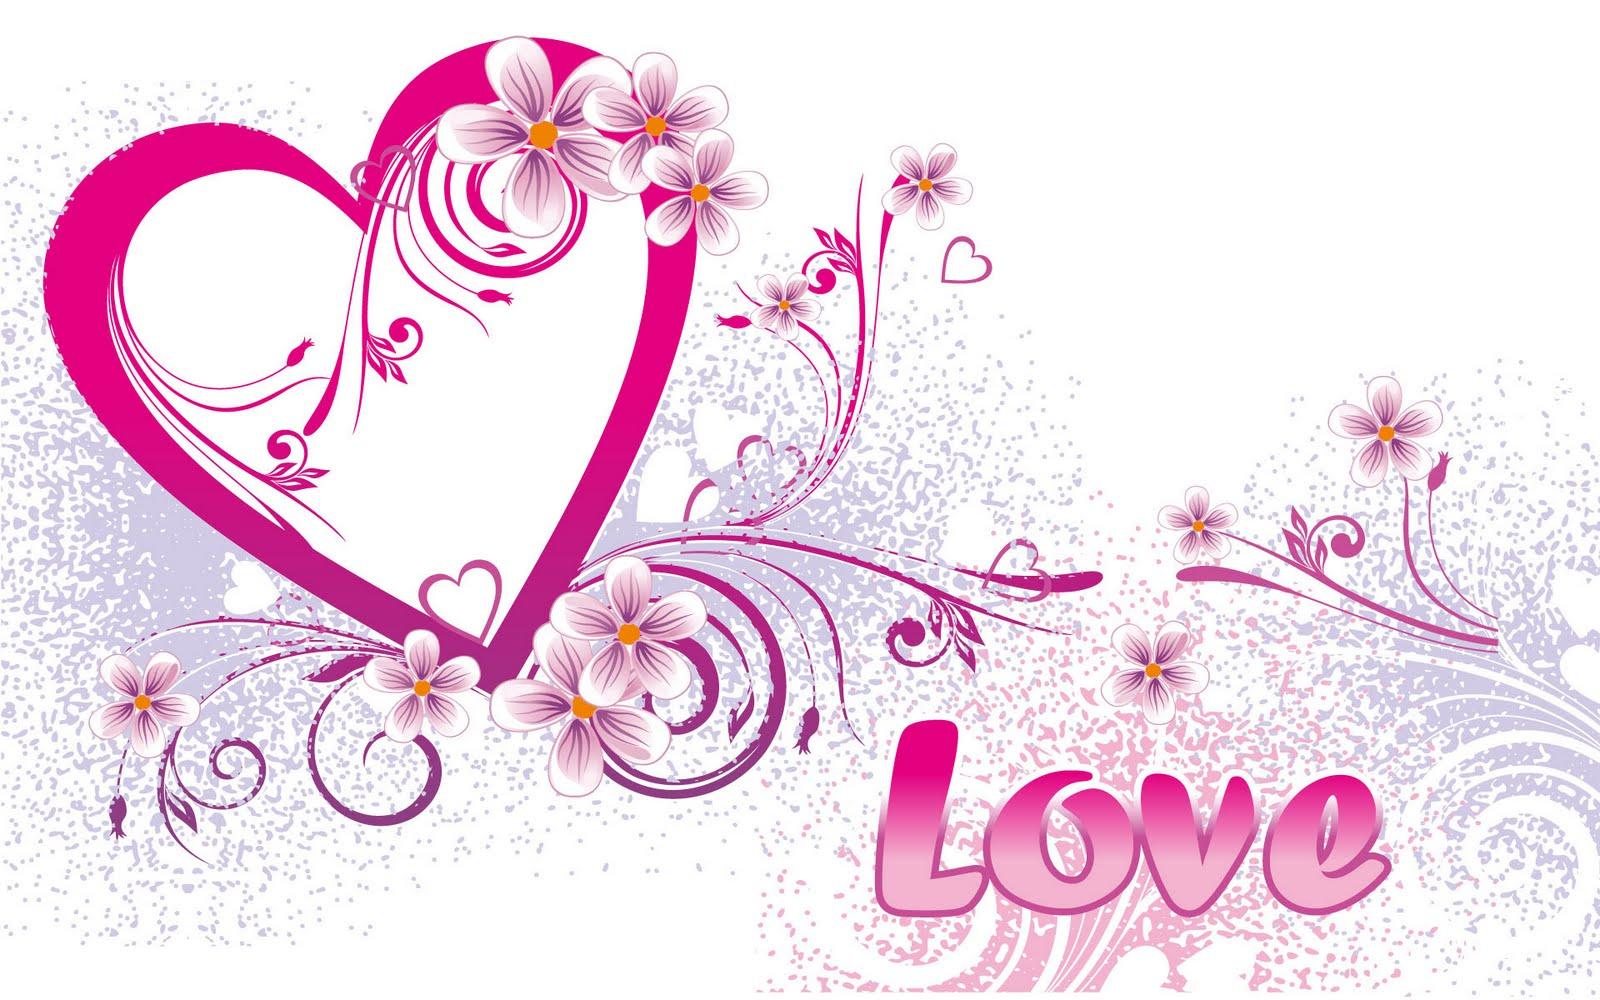 Love Heart Live Wallpaper Best Wallpapers 1600x1000